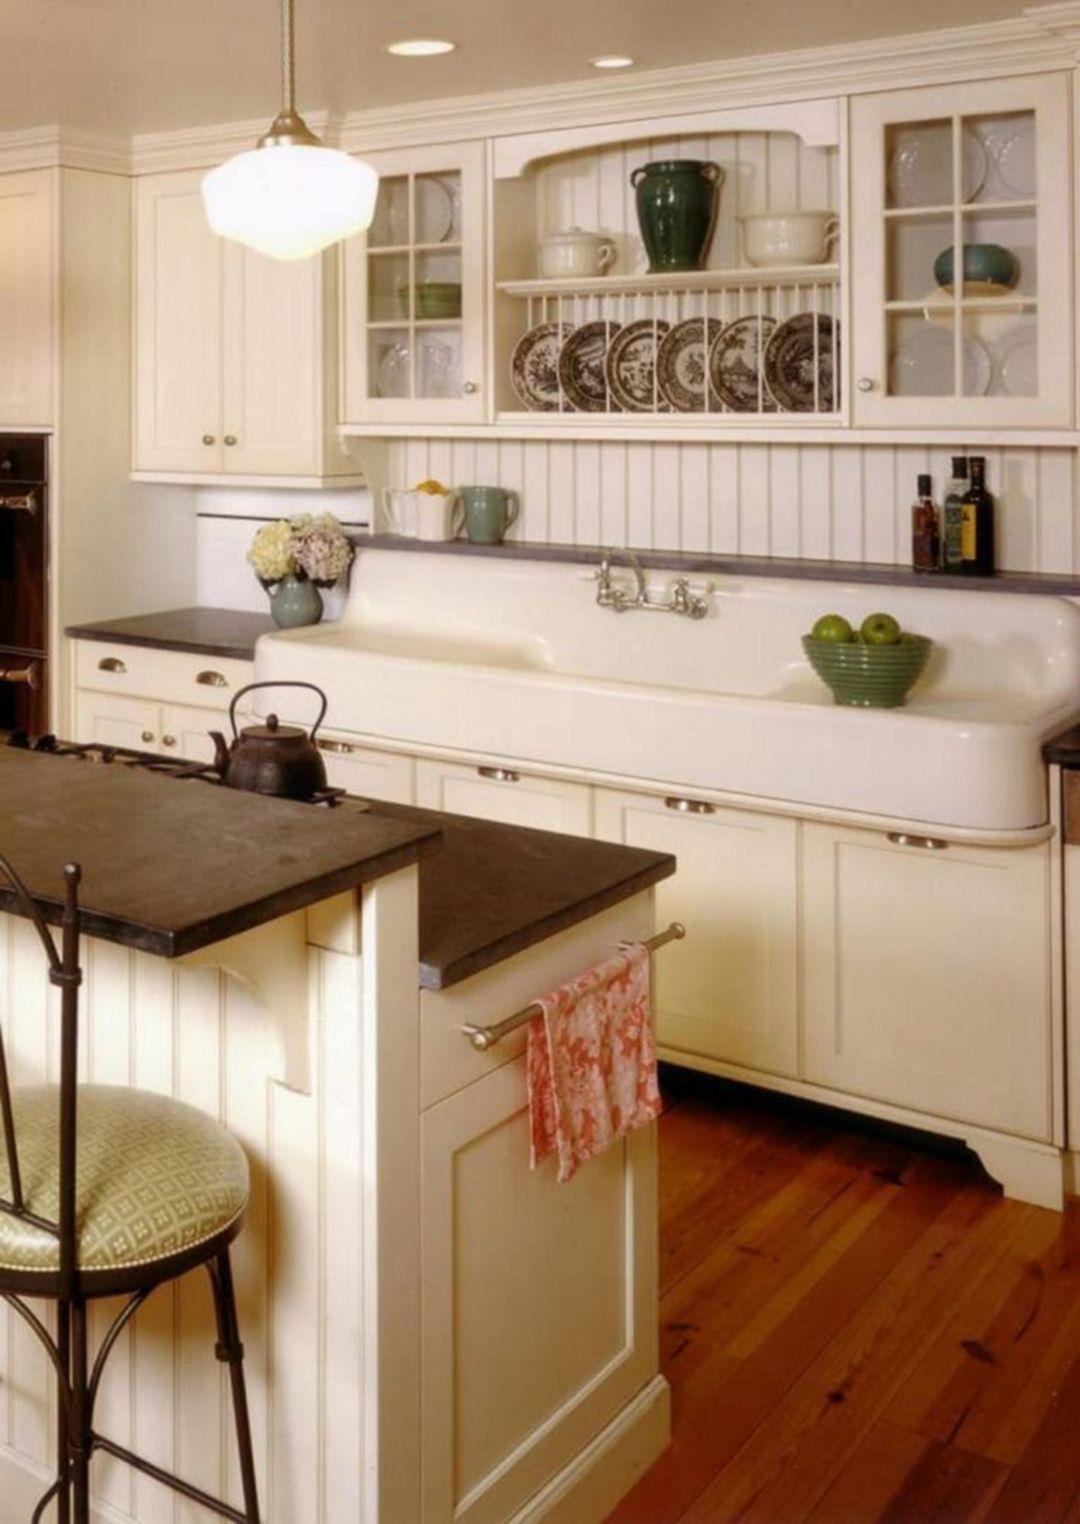 Pin By Bridget Sparrow On Dromdiah Kitchen Ideas Antique Kitchen